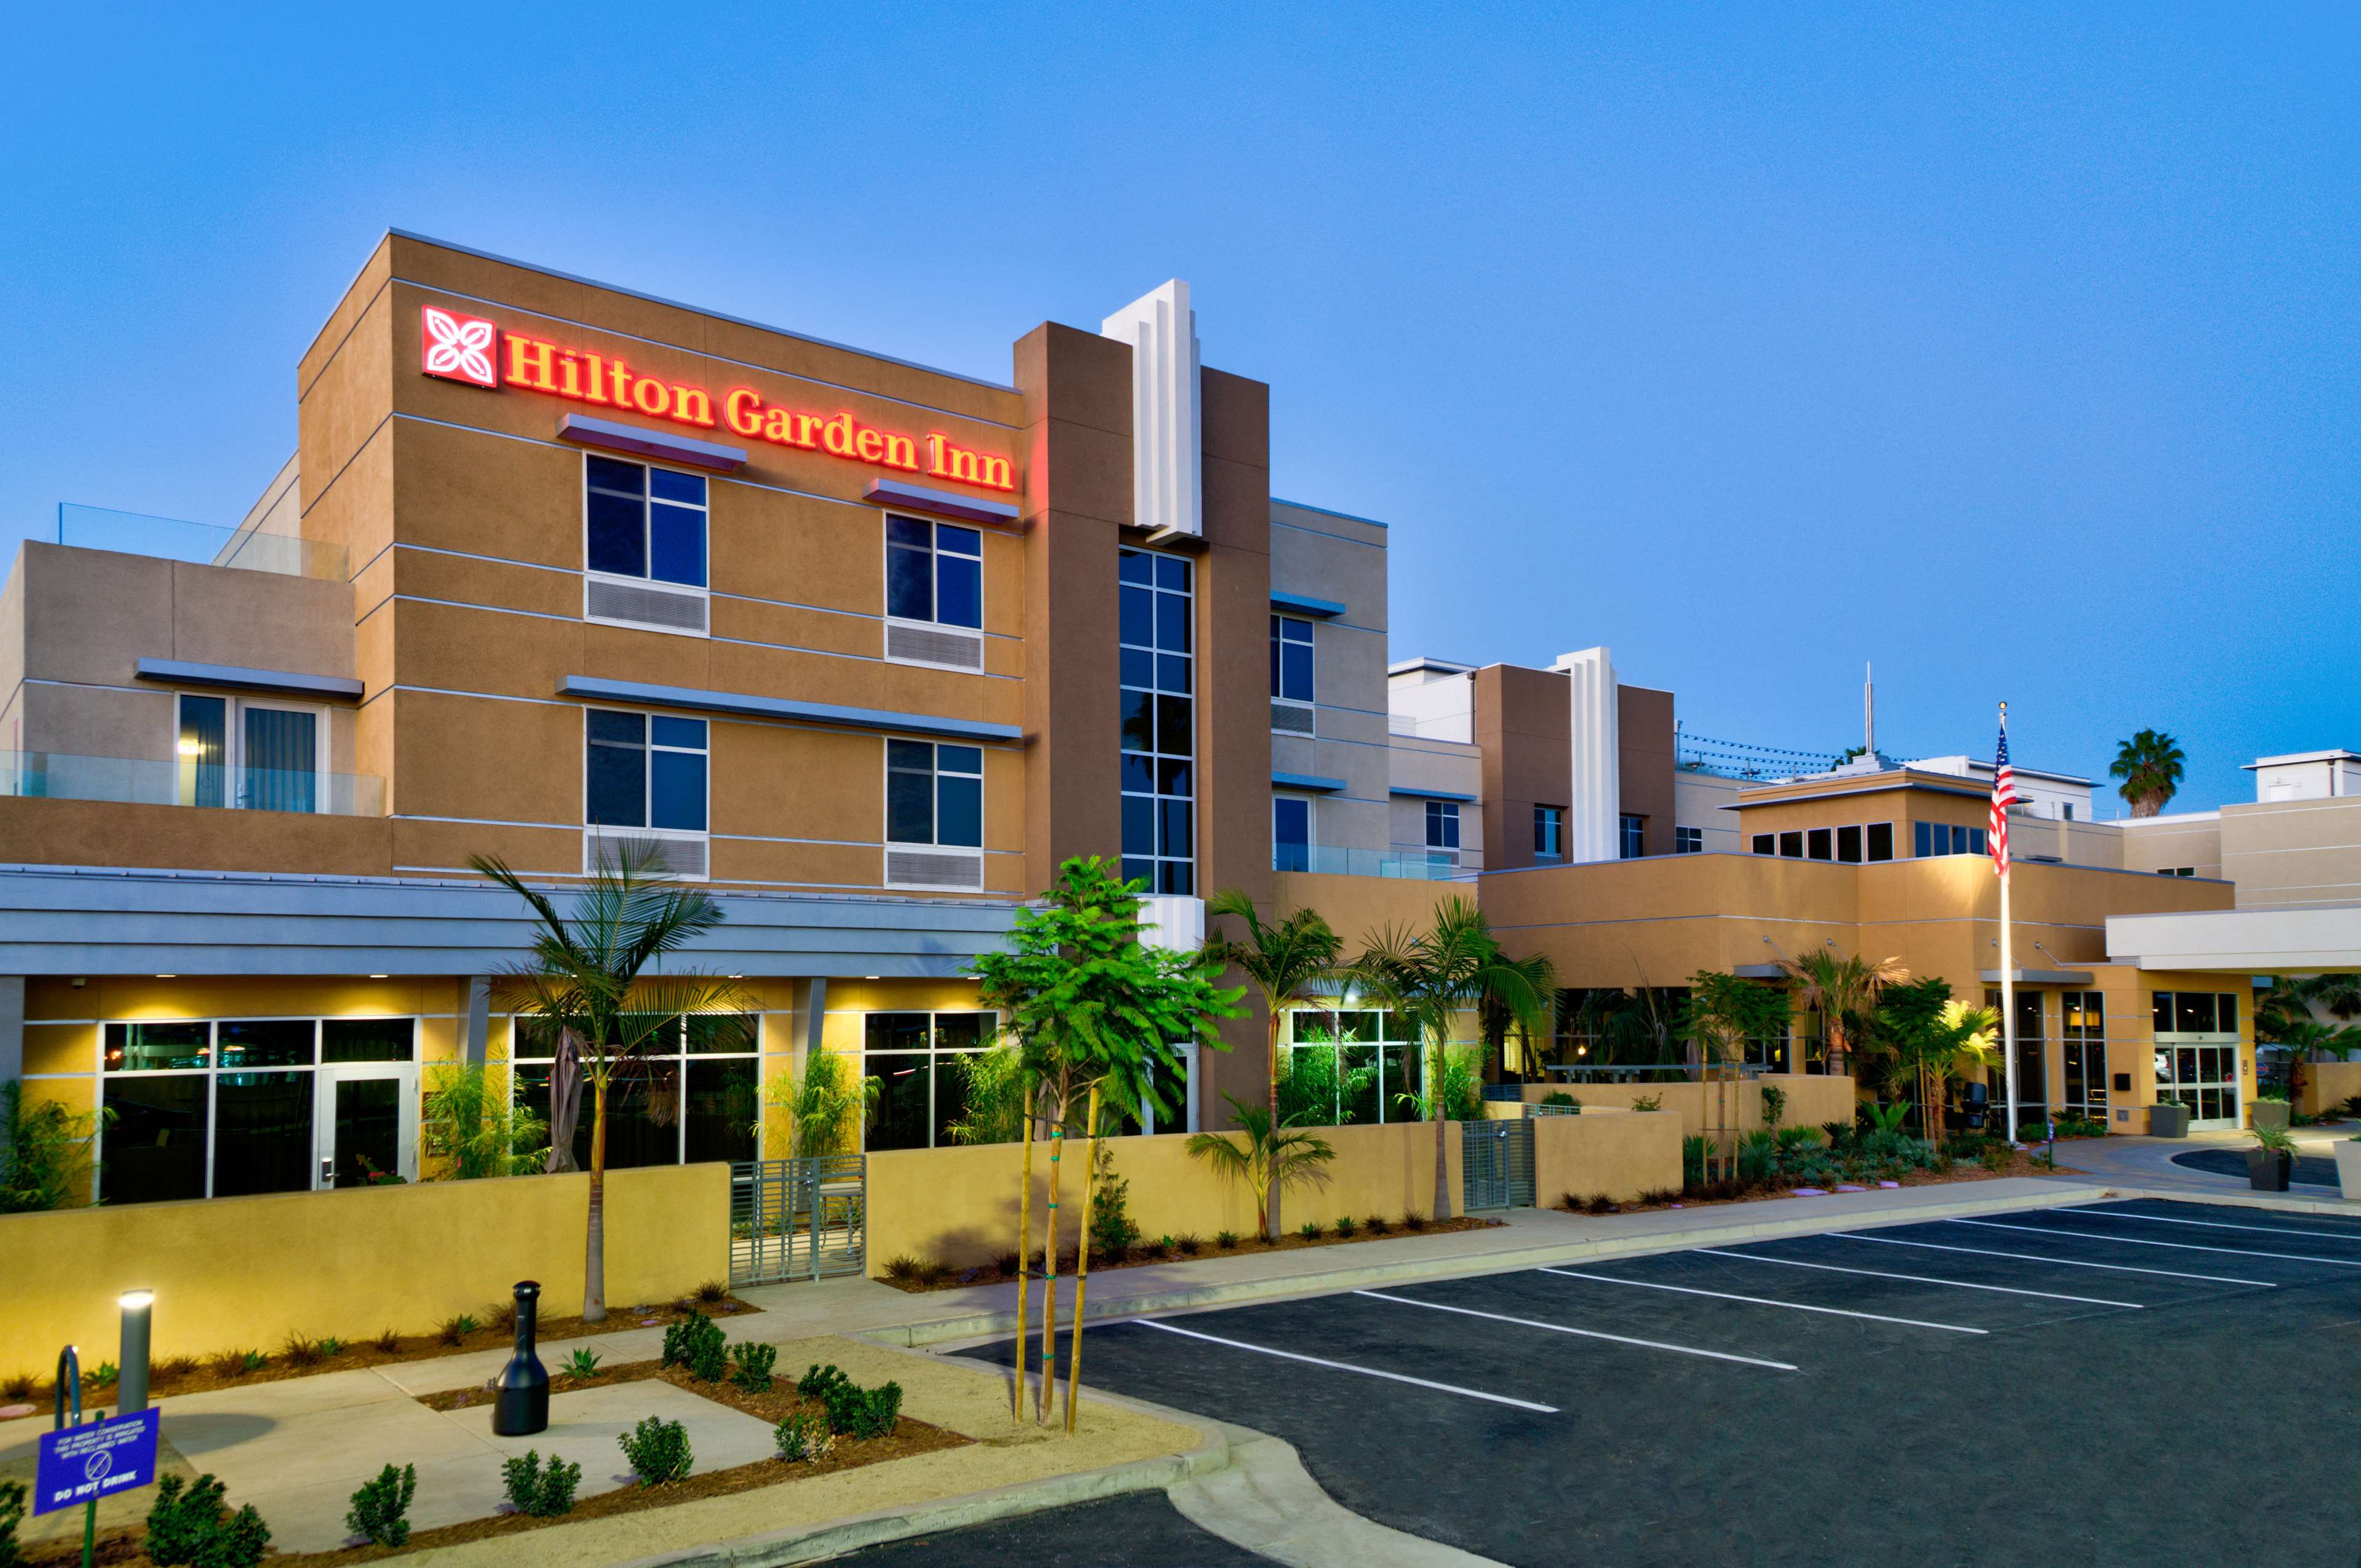 Hilton Garden Inn Santa Barbara/Goleta image 3